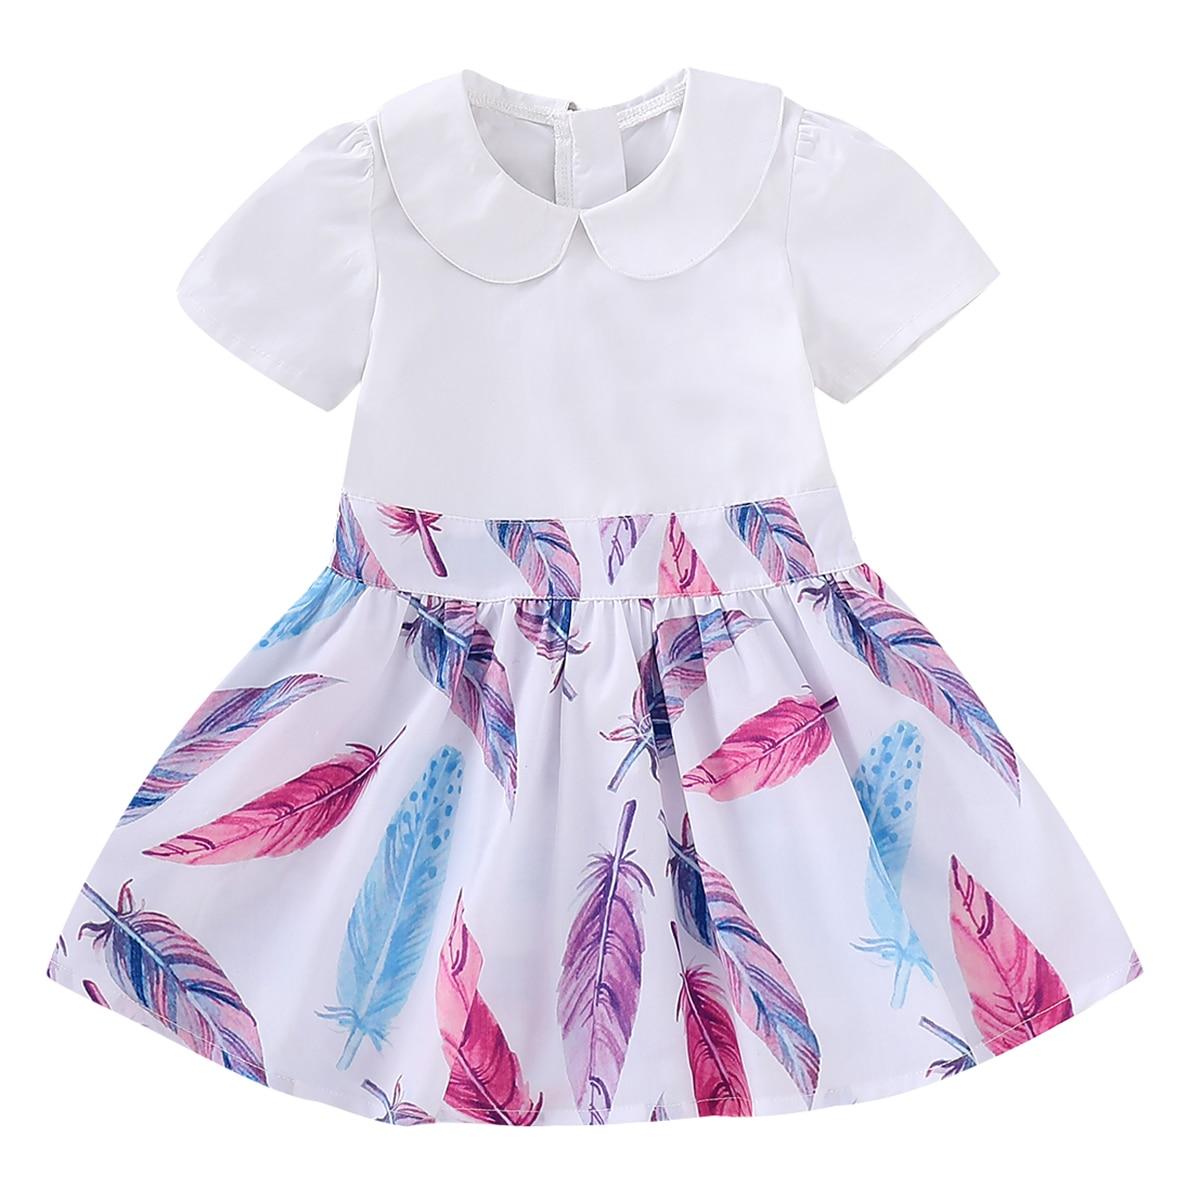 2019 verano chico niño vestidos de bebé niña vestidos de moda de impresión princesa vestido niña ropa de manga corta Anniversaire Enfant